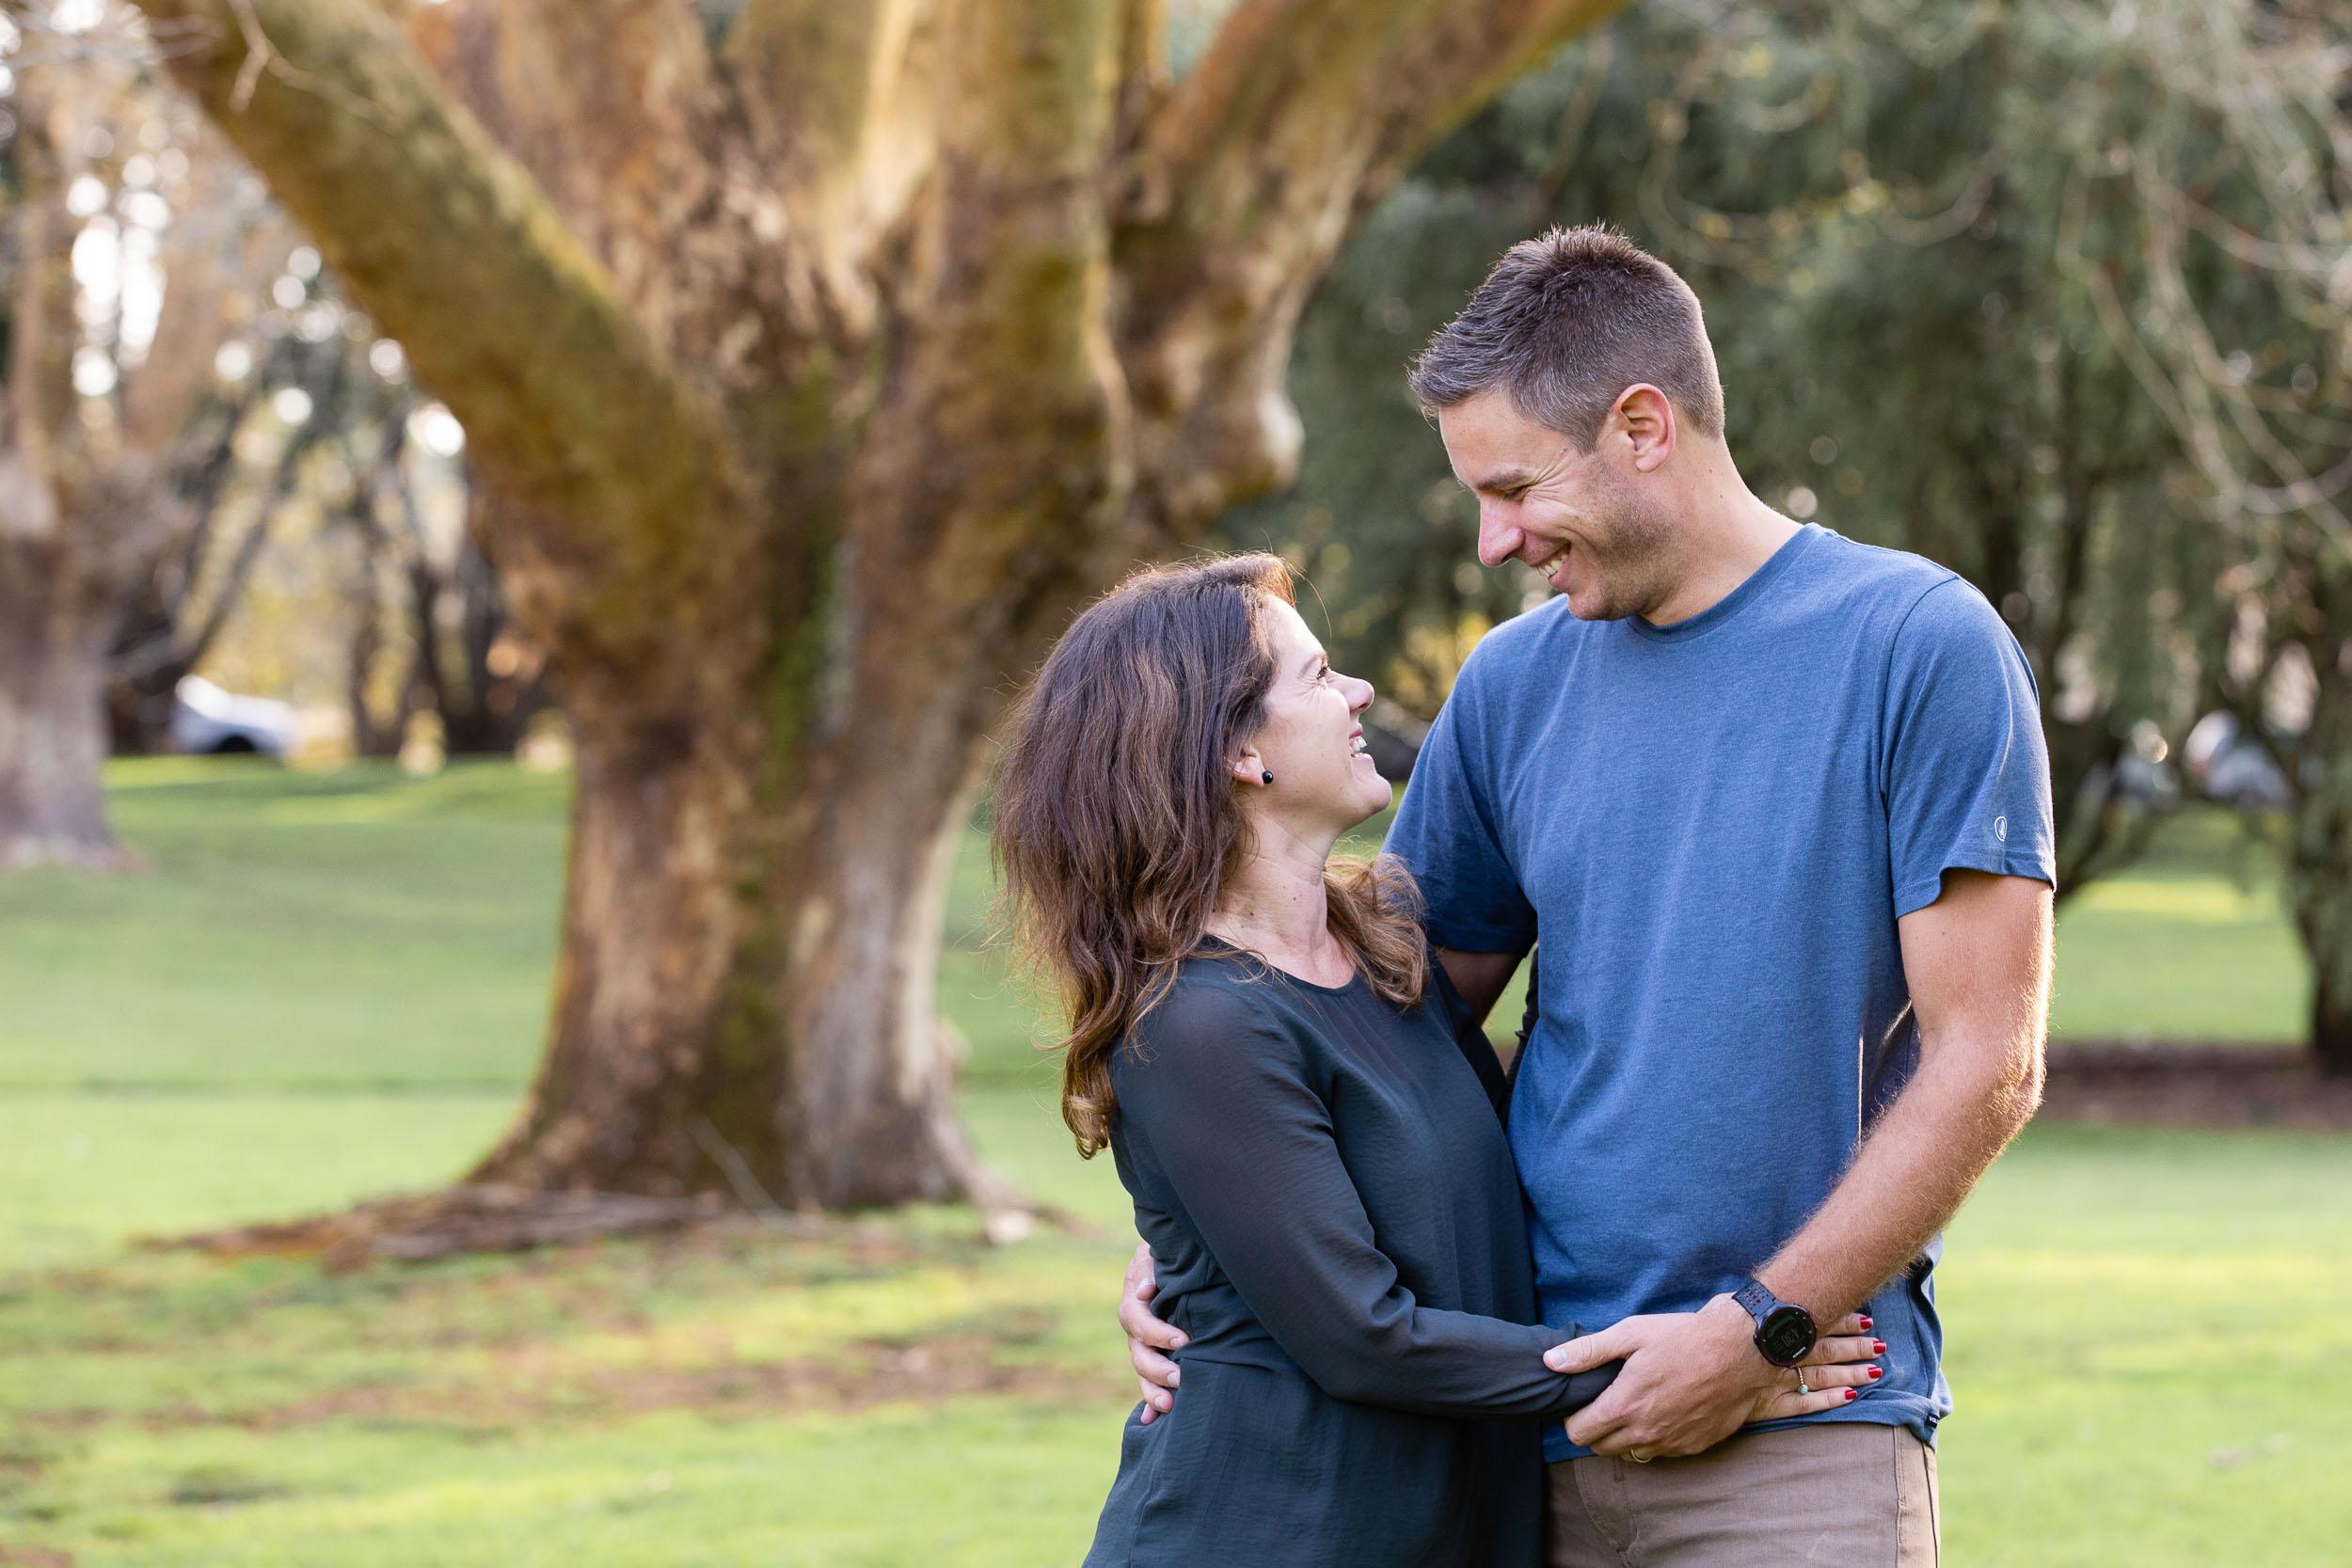 Aucklandfamilyphotographer (25 of 25).jpg